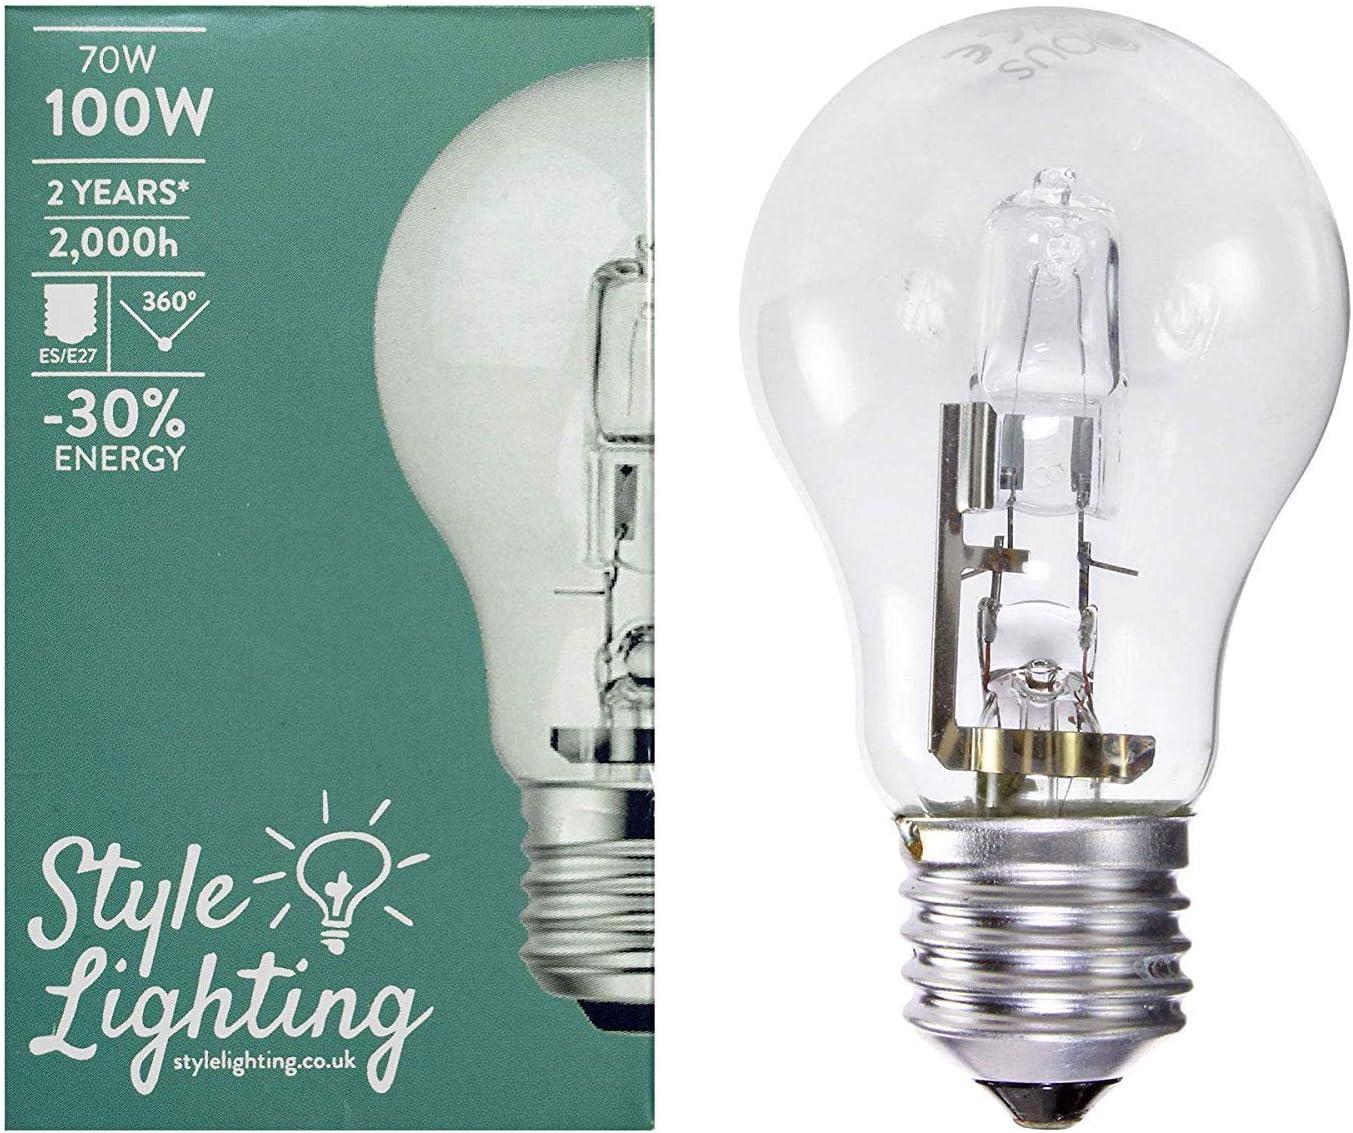 5 x Style Lighting Gl/ühbirne Eco Halogen-Energiesparlampe 70 W = 100 W ES E27 Dimmbar Warmwei/ß